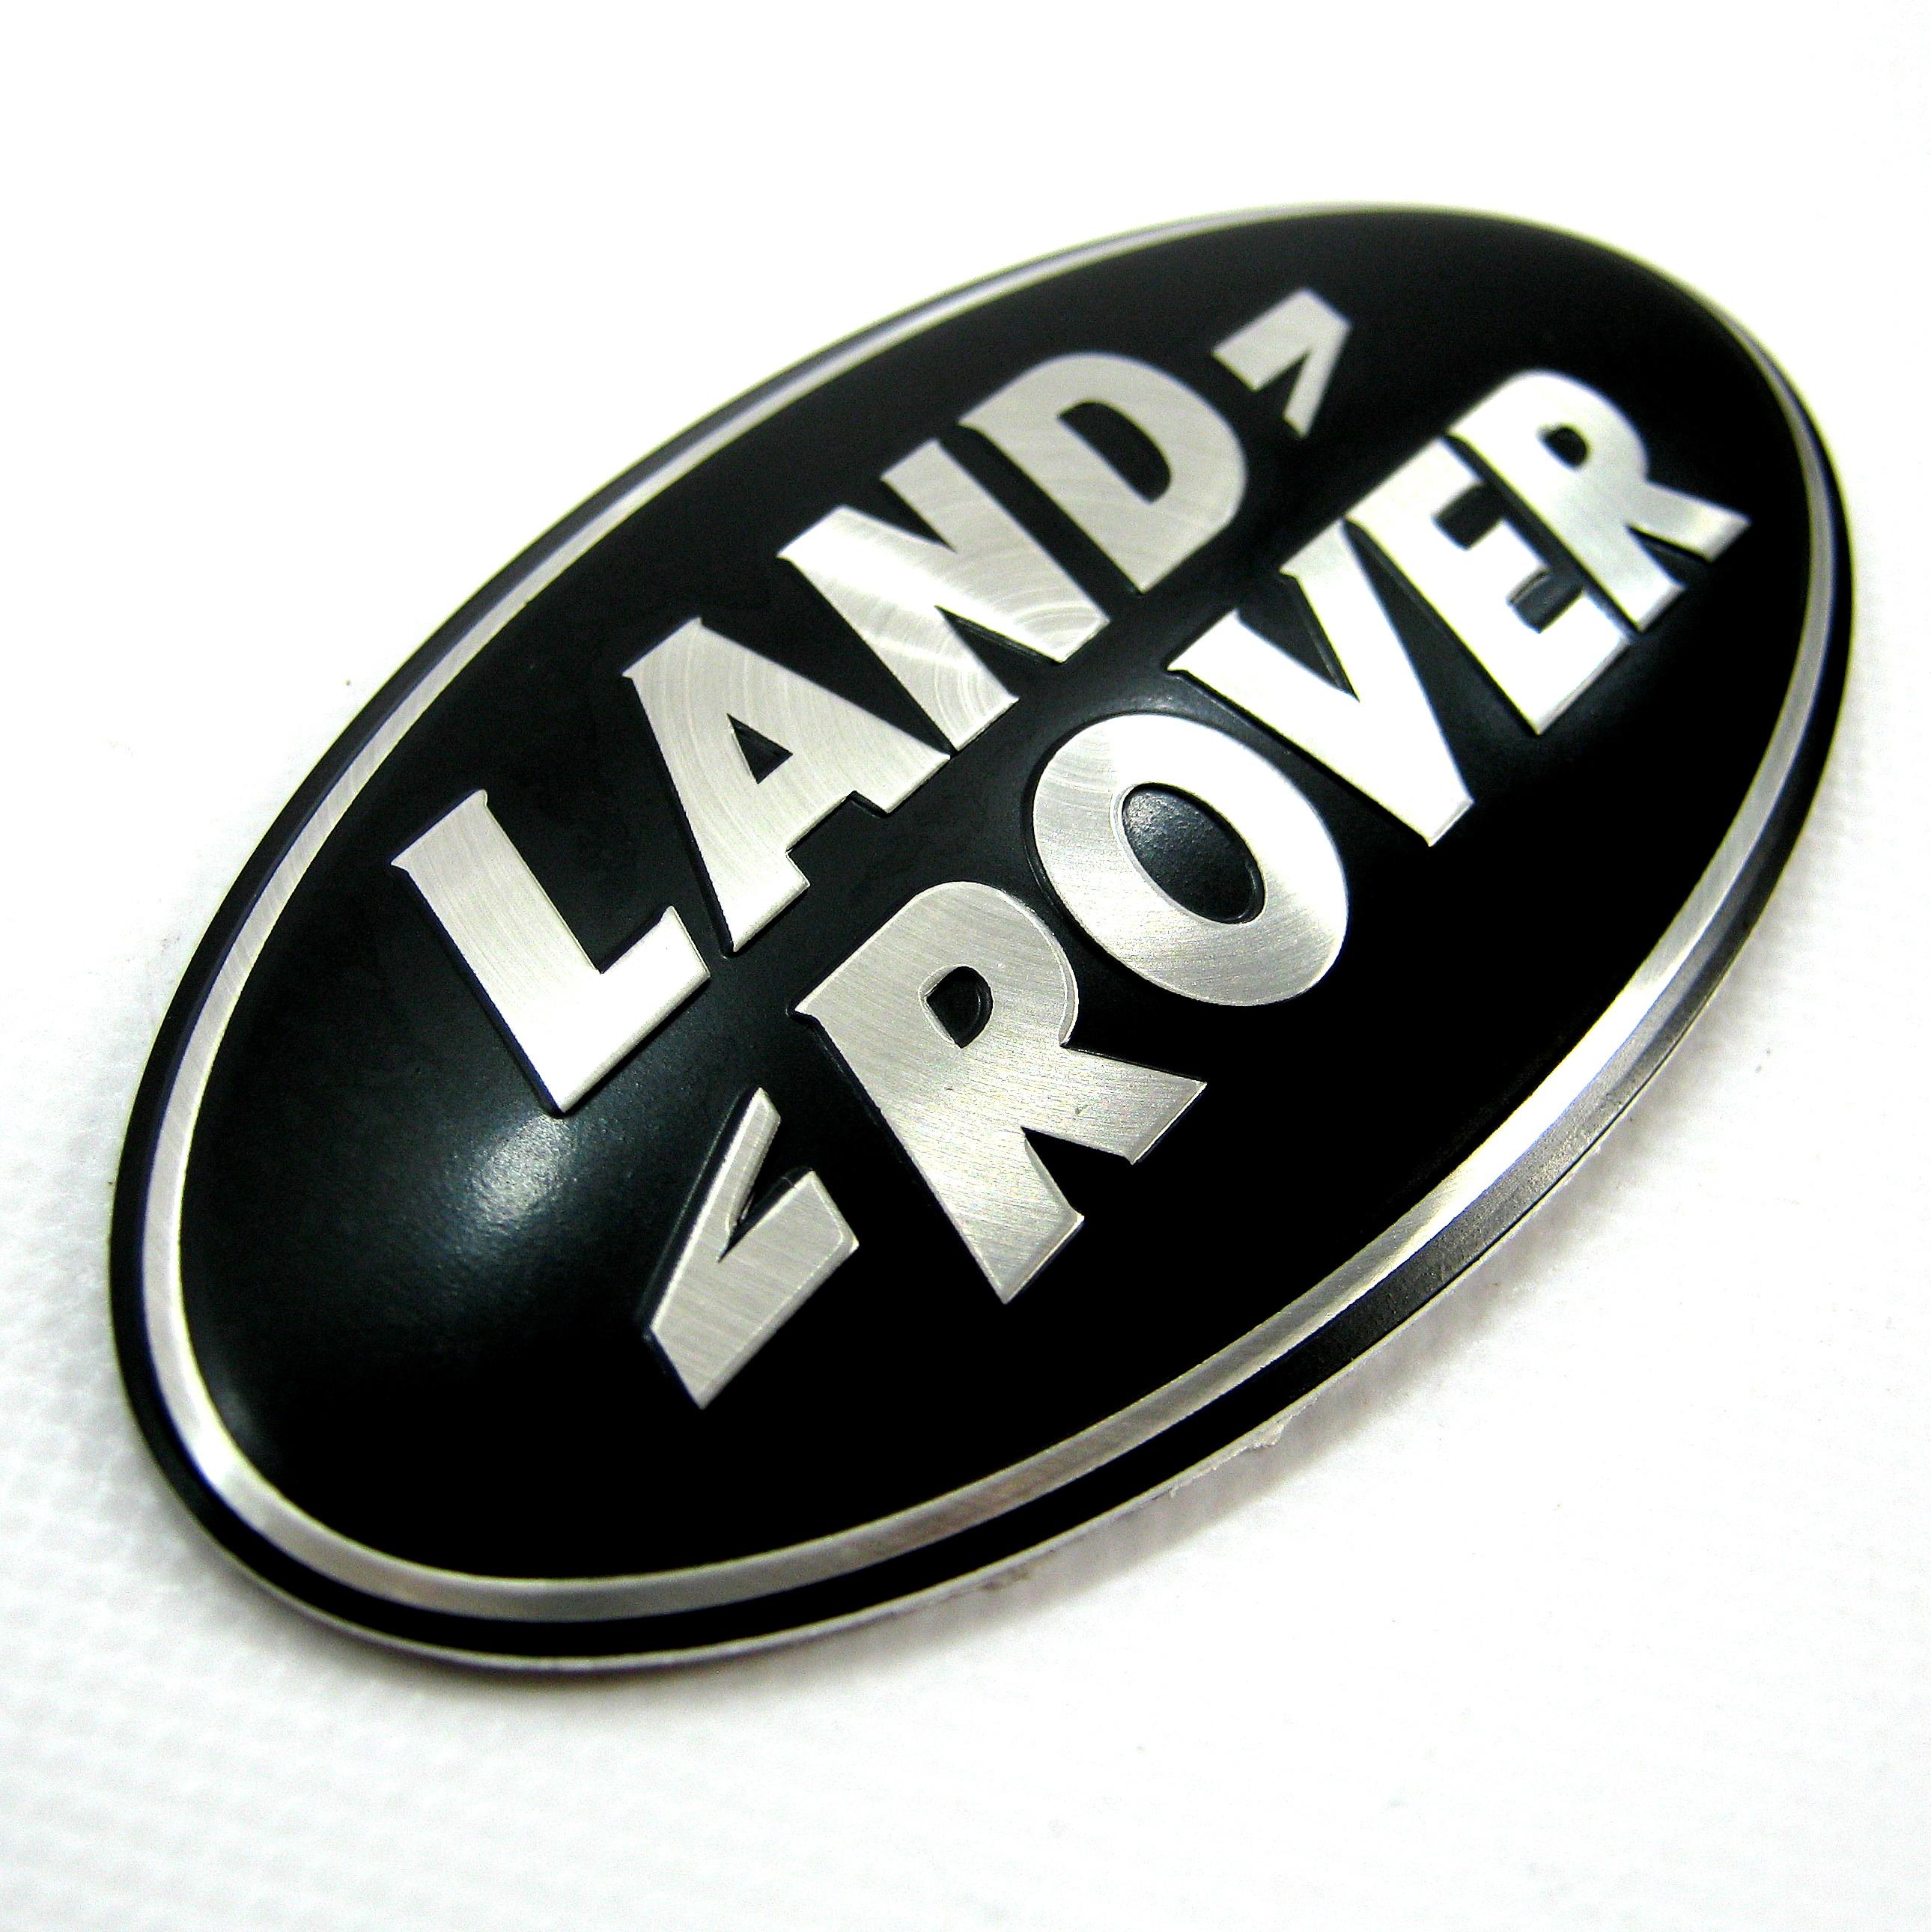 Land Rover Freelander 1 BLACK SILVER rear door badge oval logo